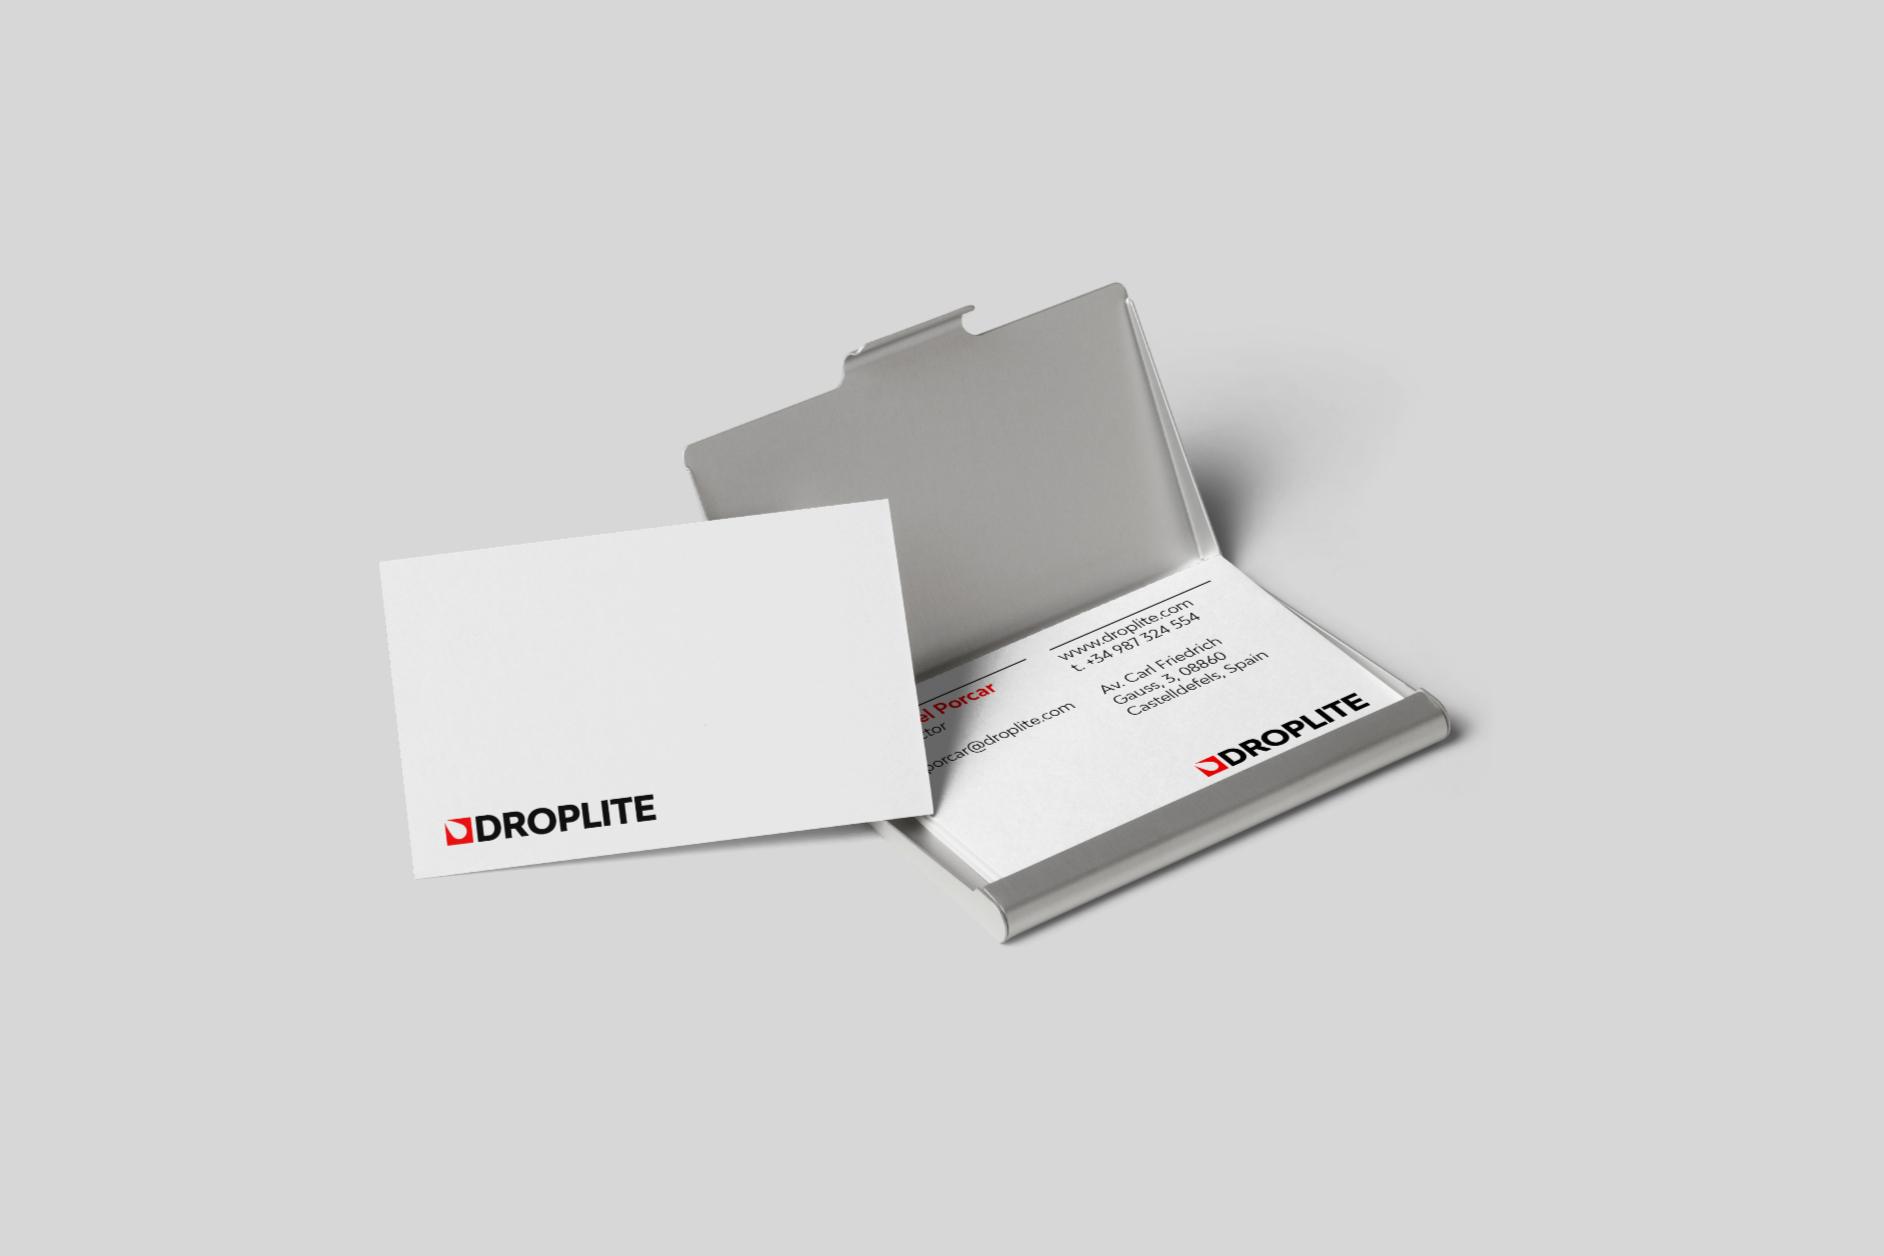 Droplite-business-card-mockup-Daniel-Cavalcanti